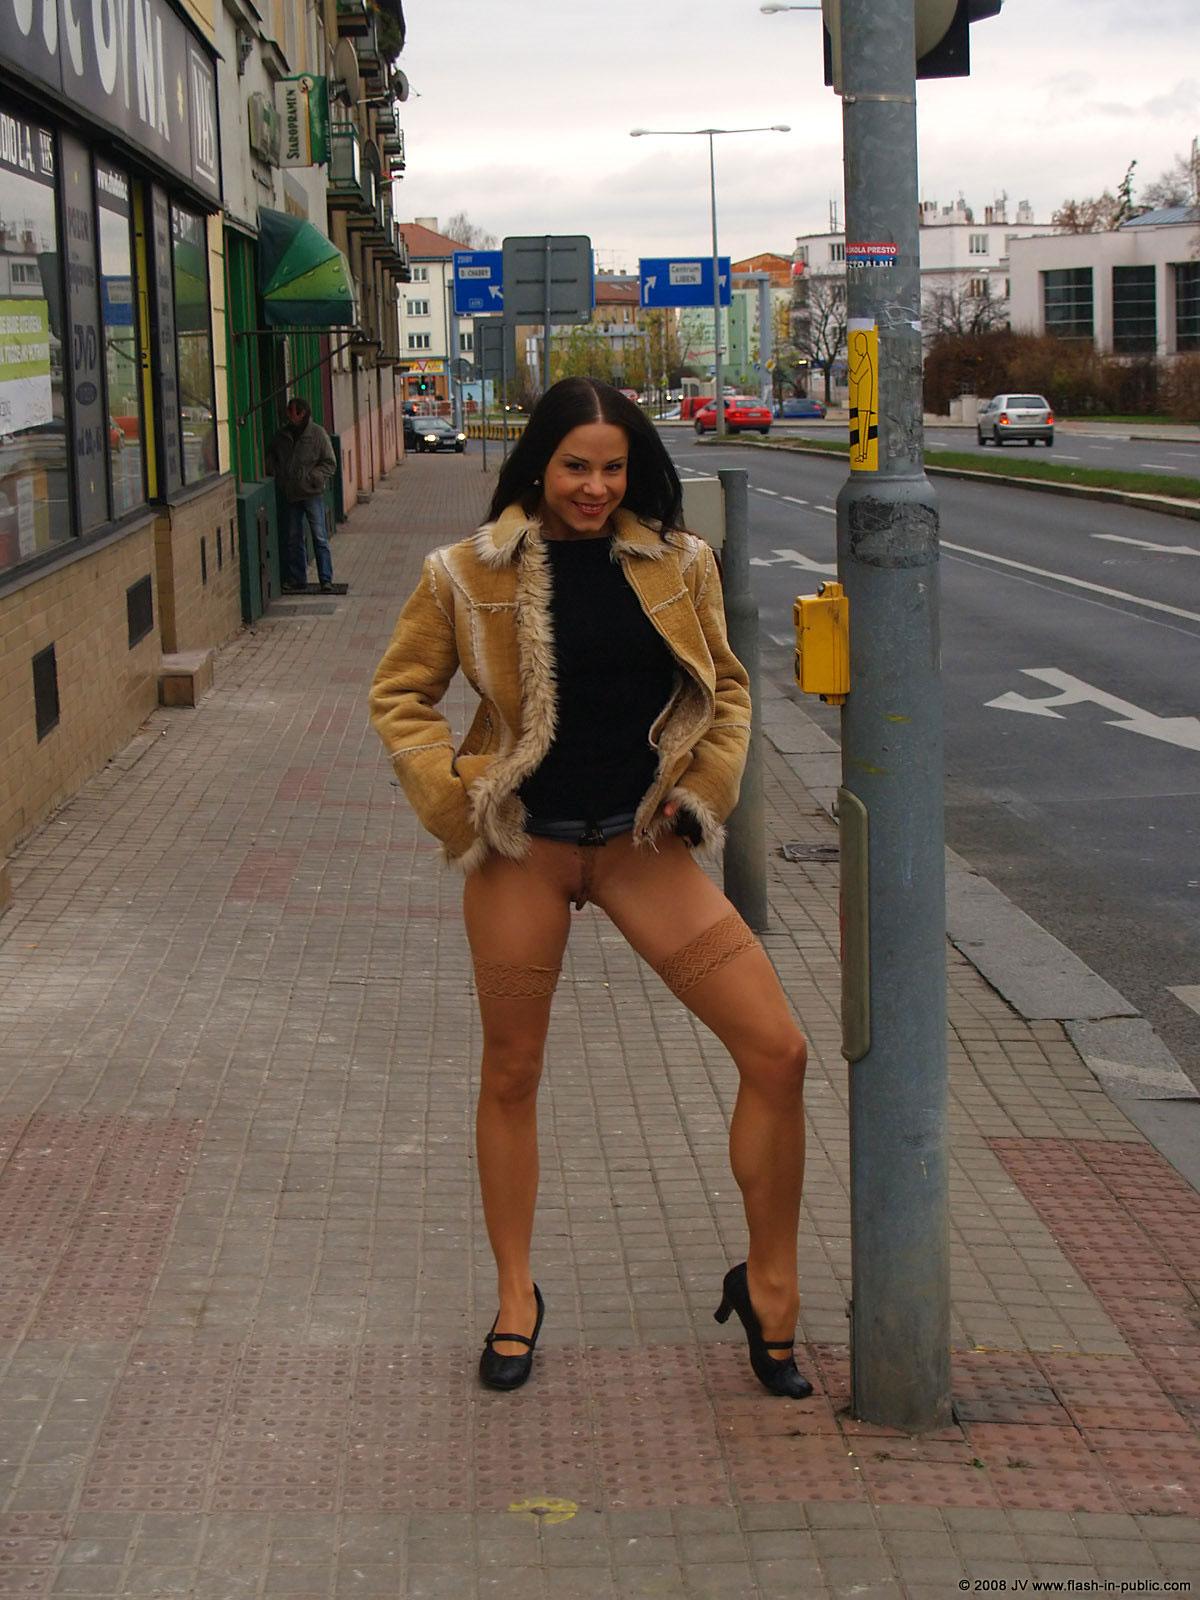 alexandra-g-bottomless-stockings-flash-in-public-03